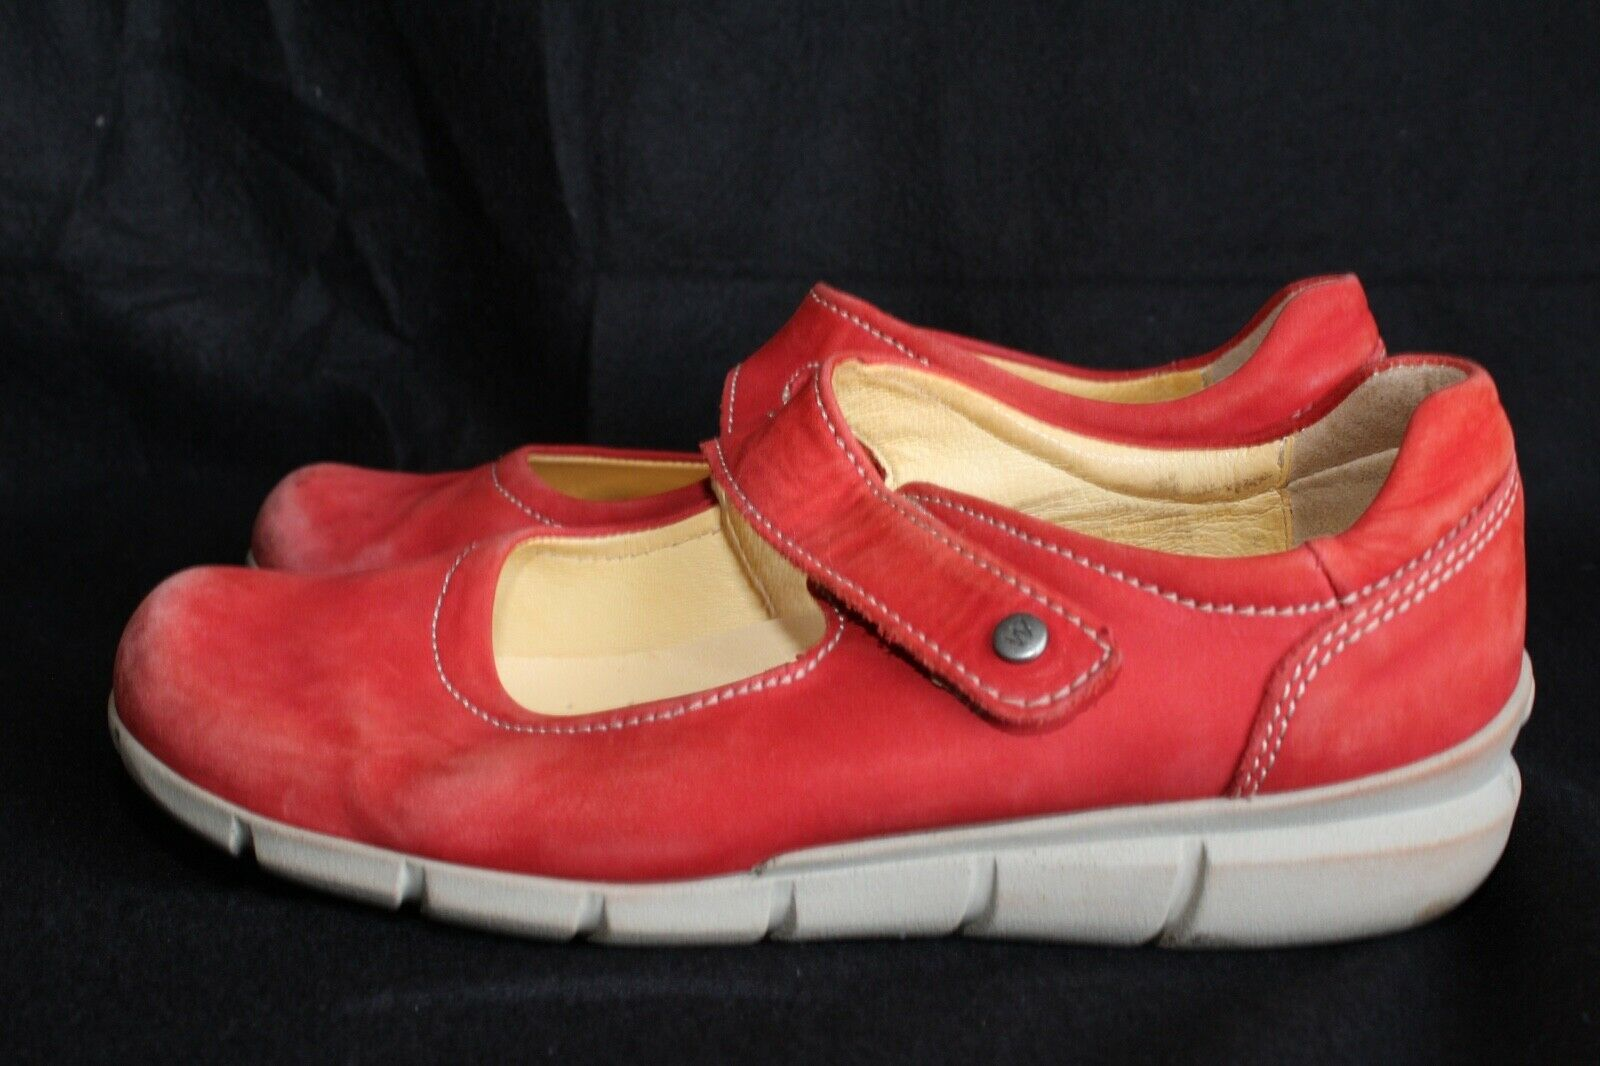 Wolky Damen Schuhe Sandale Turnschuhe  Gr. 39